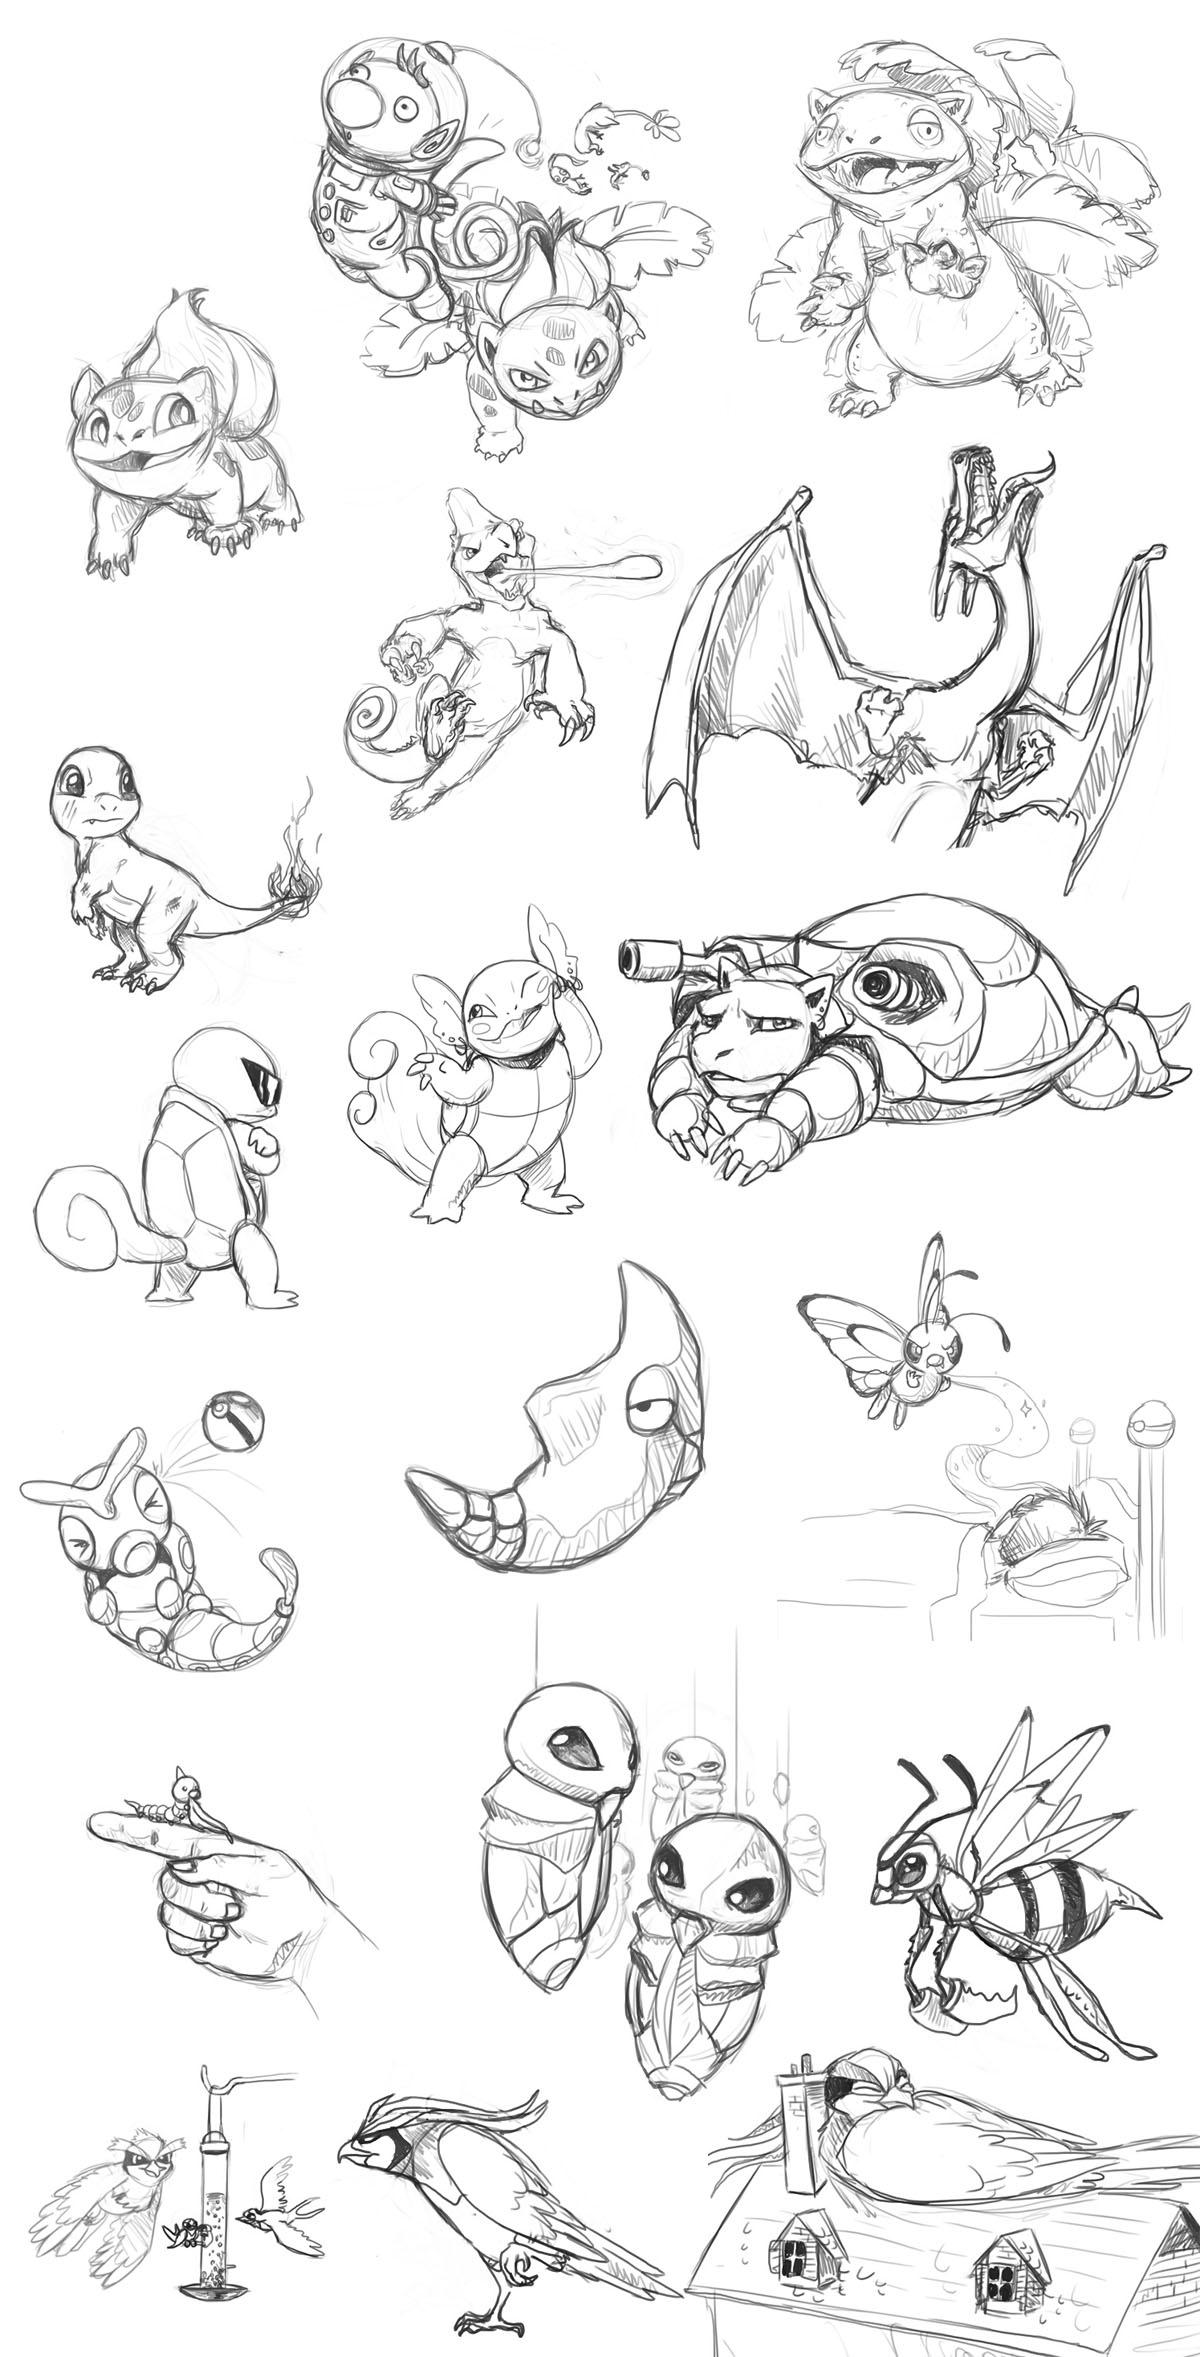 Pokemon 001 - 018 by stuffed